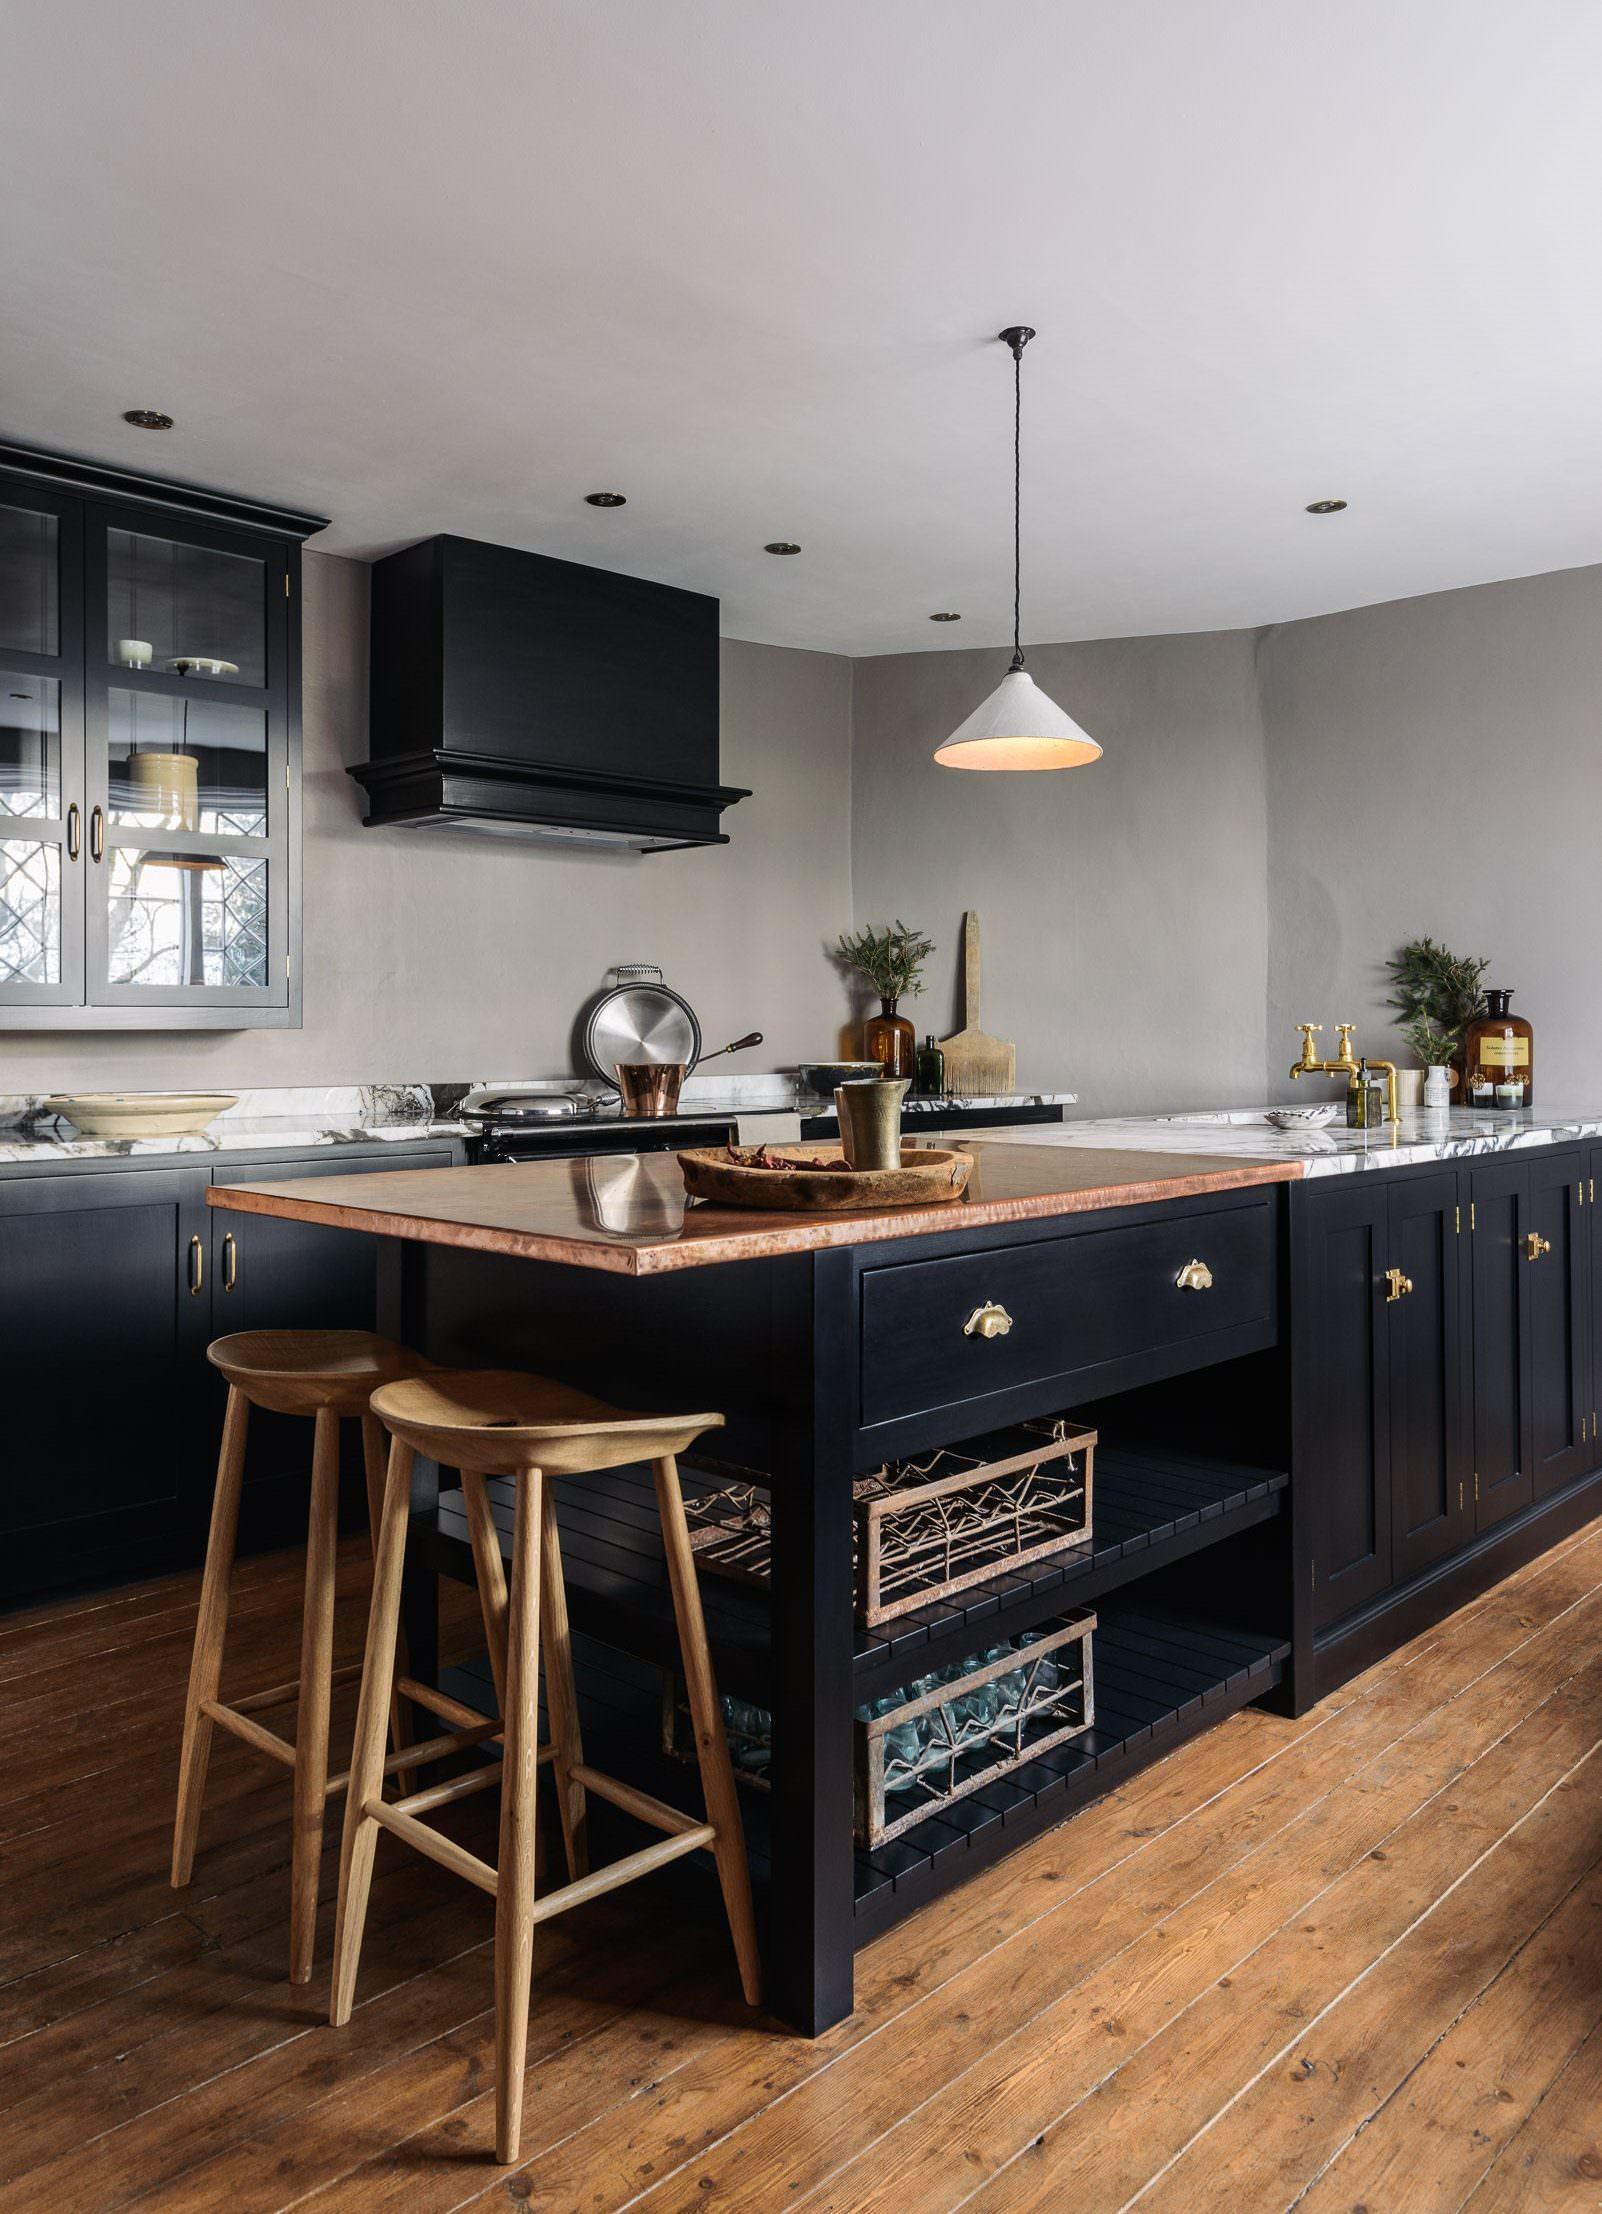 New showroom in the Millhouse - The deVOL Journal - deVOL Kitchens